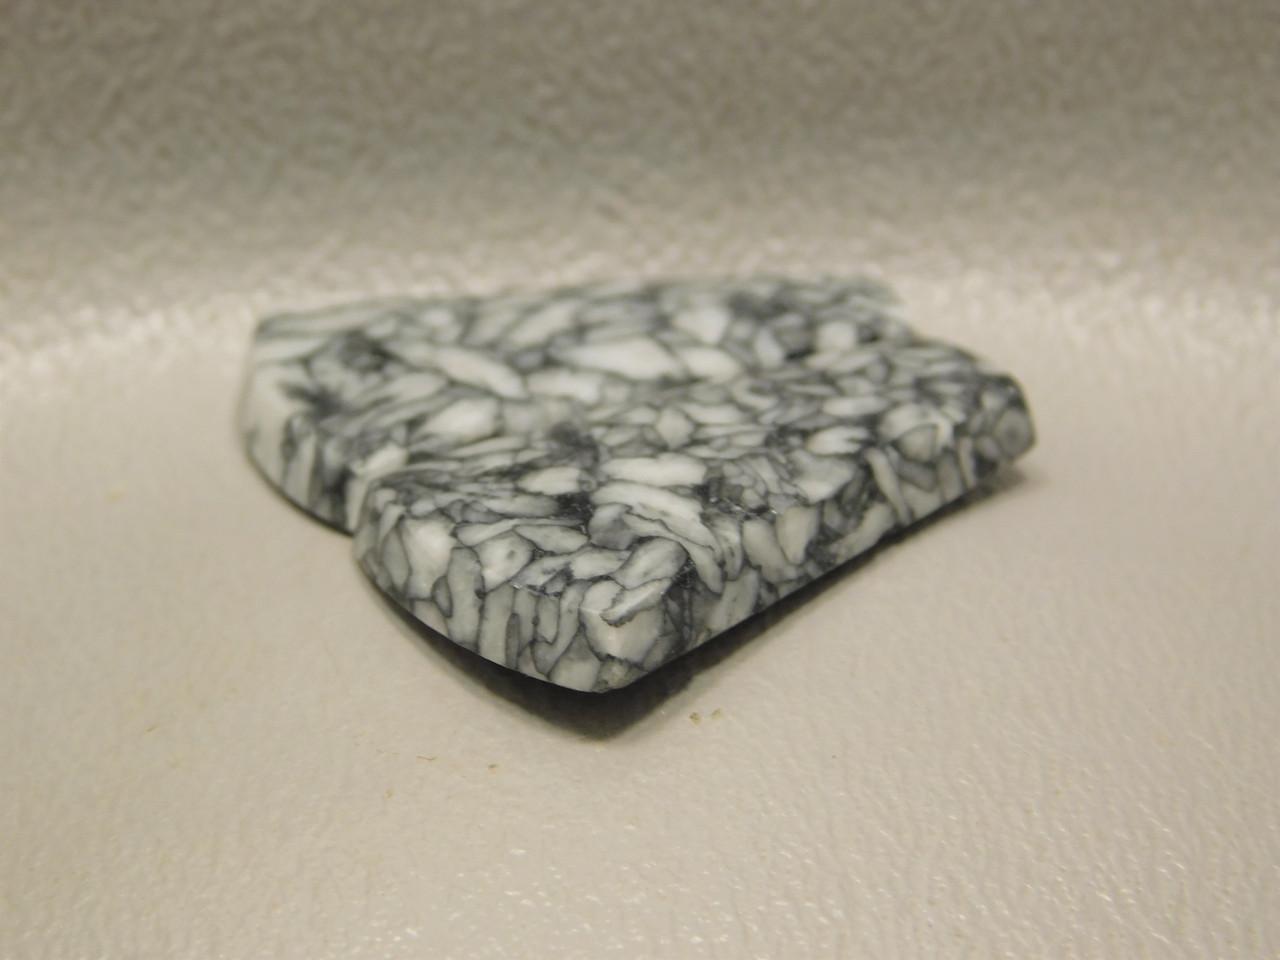 Pinolith Pinolite Austria Matched Pair Stone Designer Cabochons #6